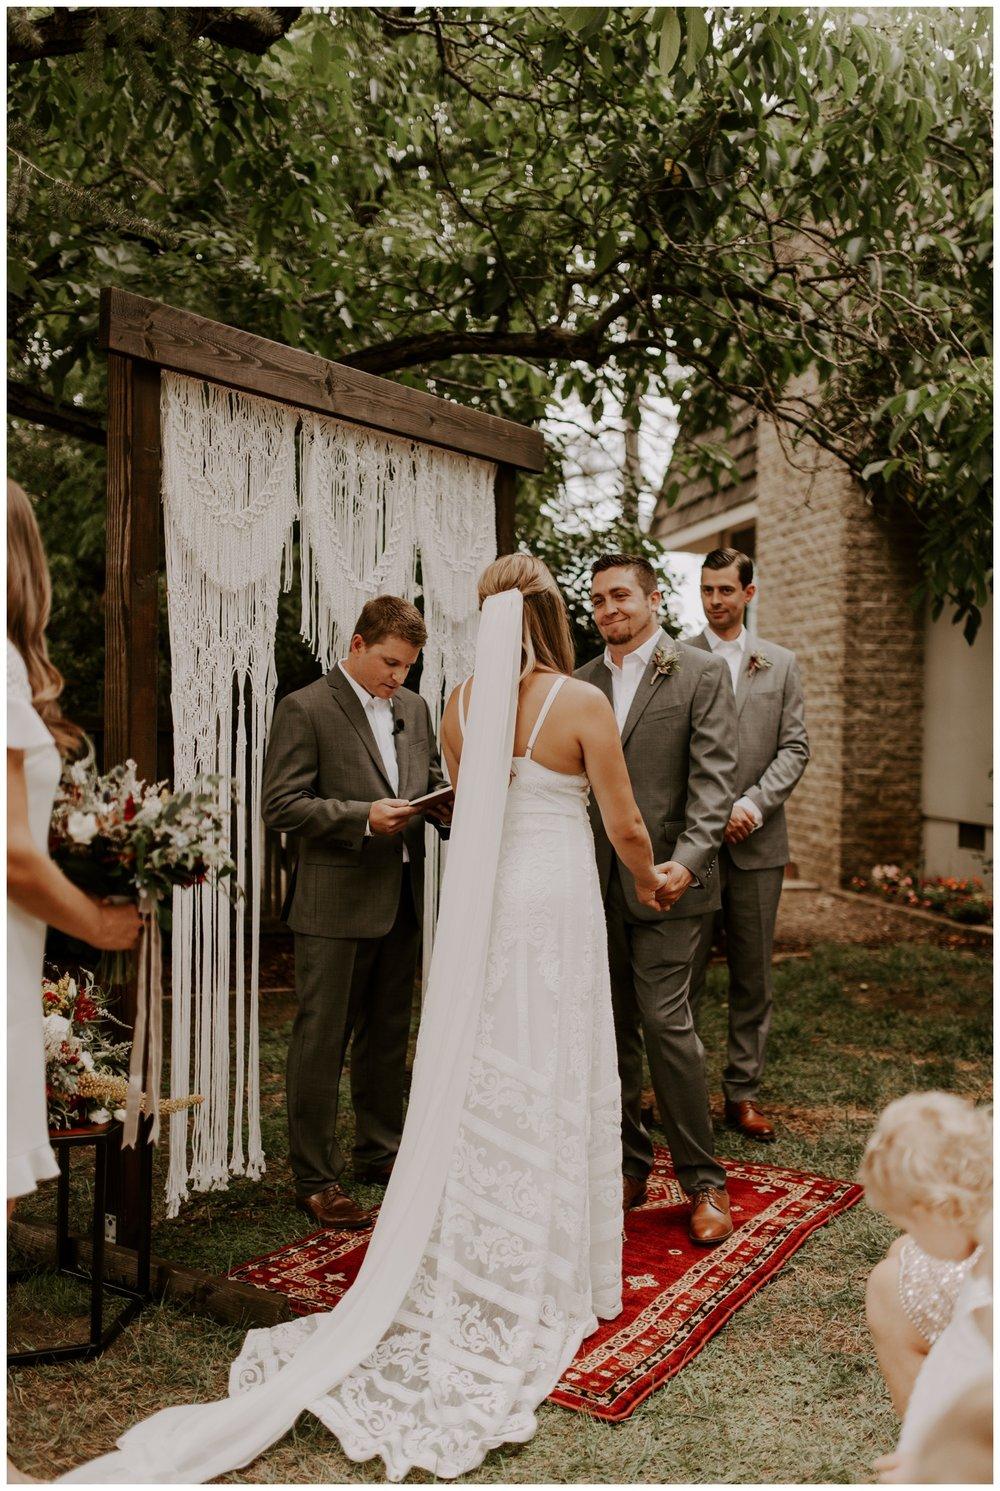 Napa Valley Backyard Wedding and Reception at Elizabeth Spencer Winery | Jessica Heron Images 057.jpg